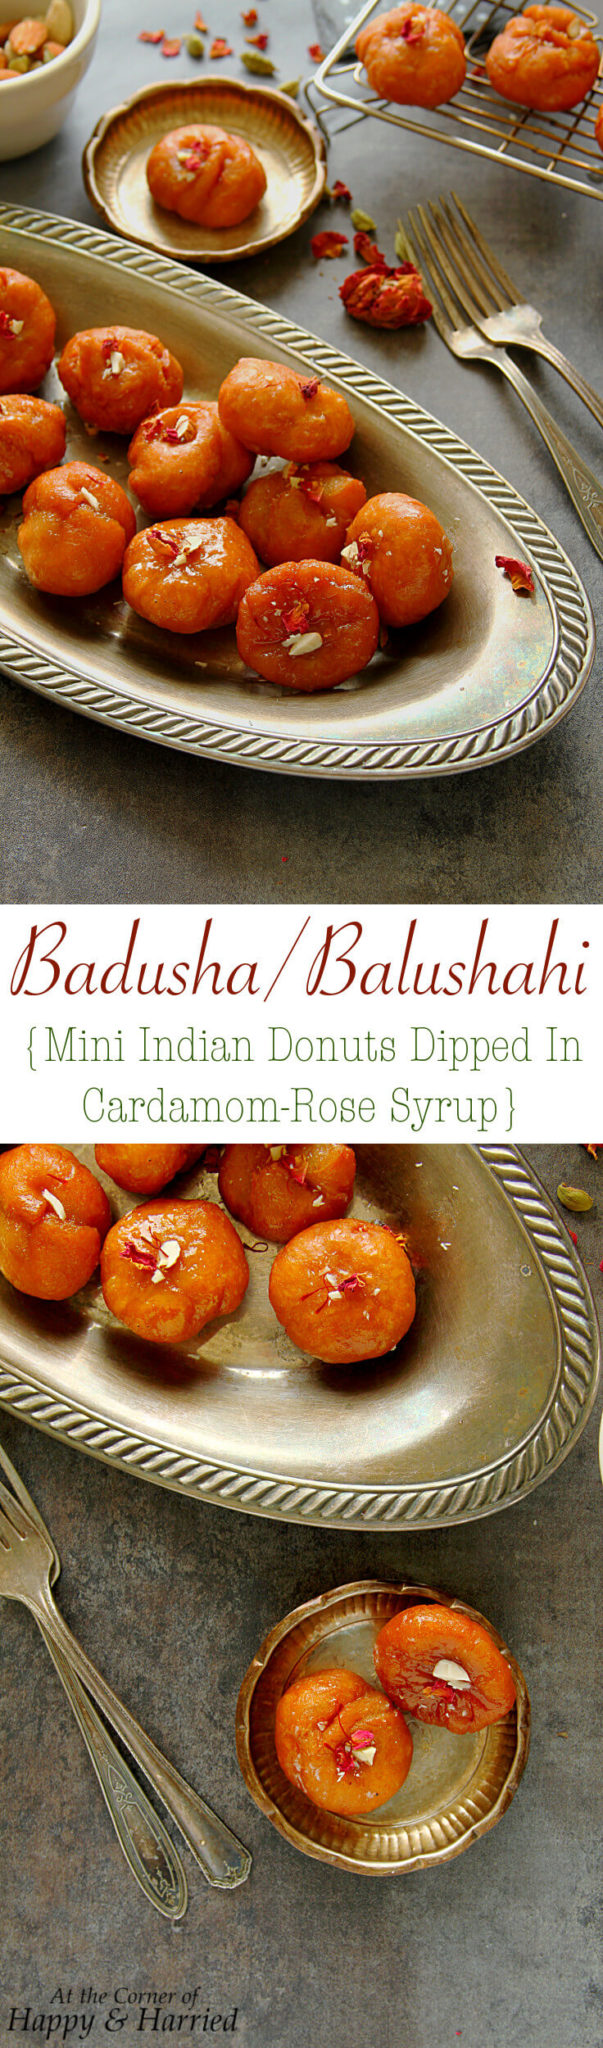 BADUSHA OR BALUSHAHI (MINI INDIAN DONUTS DIPPED IN CARDAMOM-ROSE SYRUP) - HAPPY&HARRIED